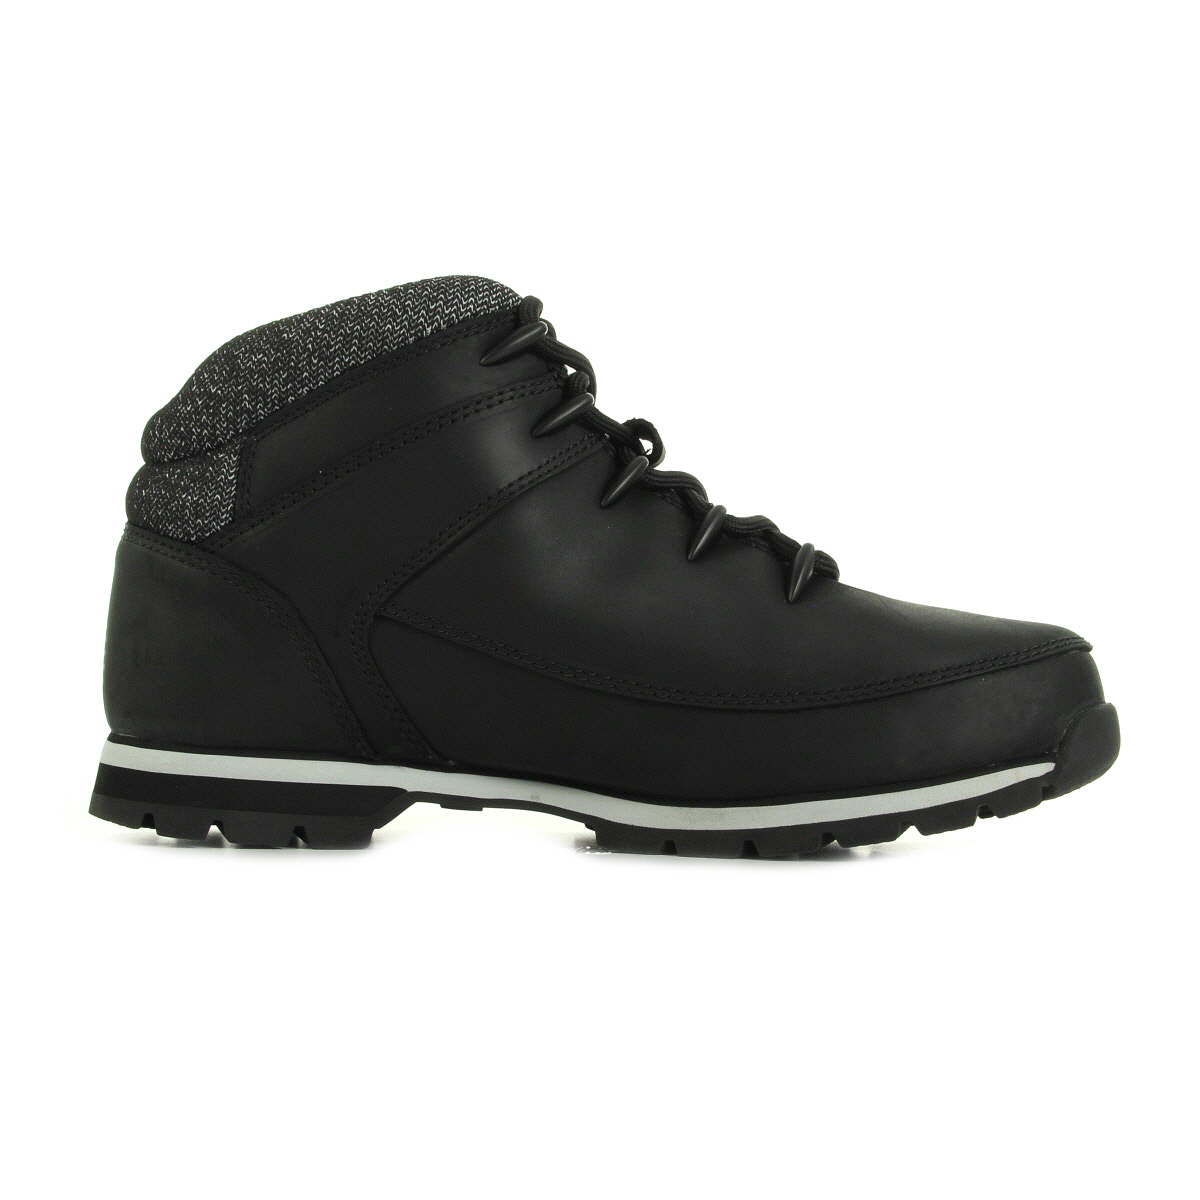 Timberland Euro Sprint Hiker Black Full Grain CA18OX, Boots homme